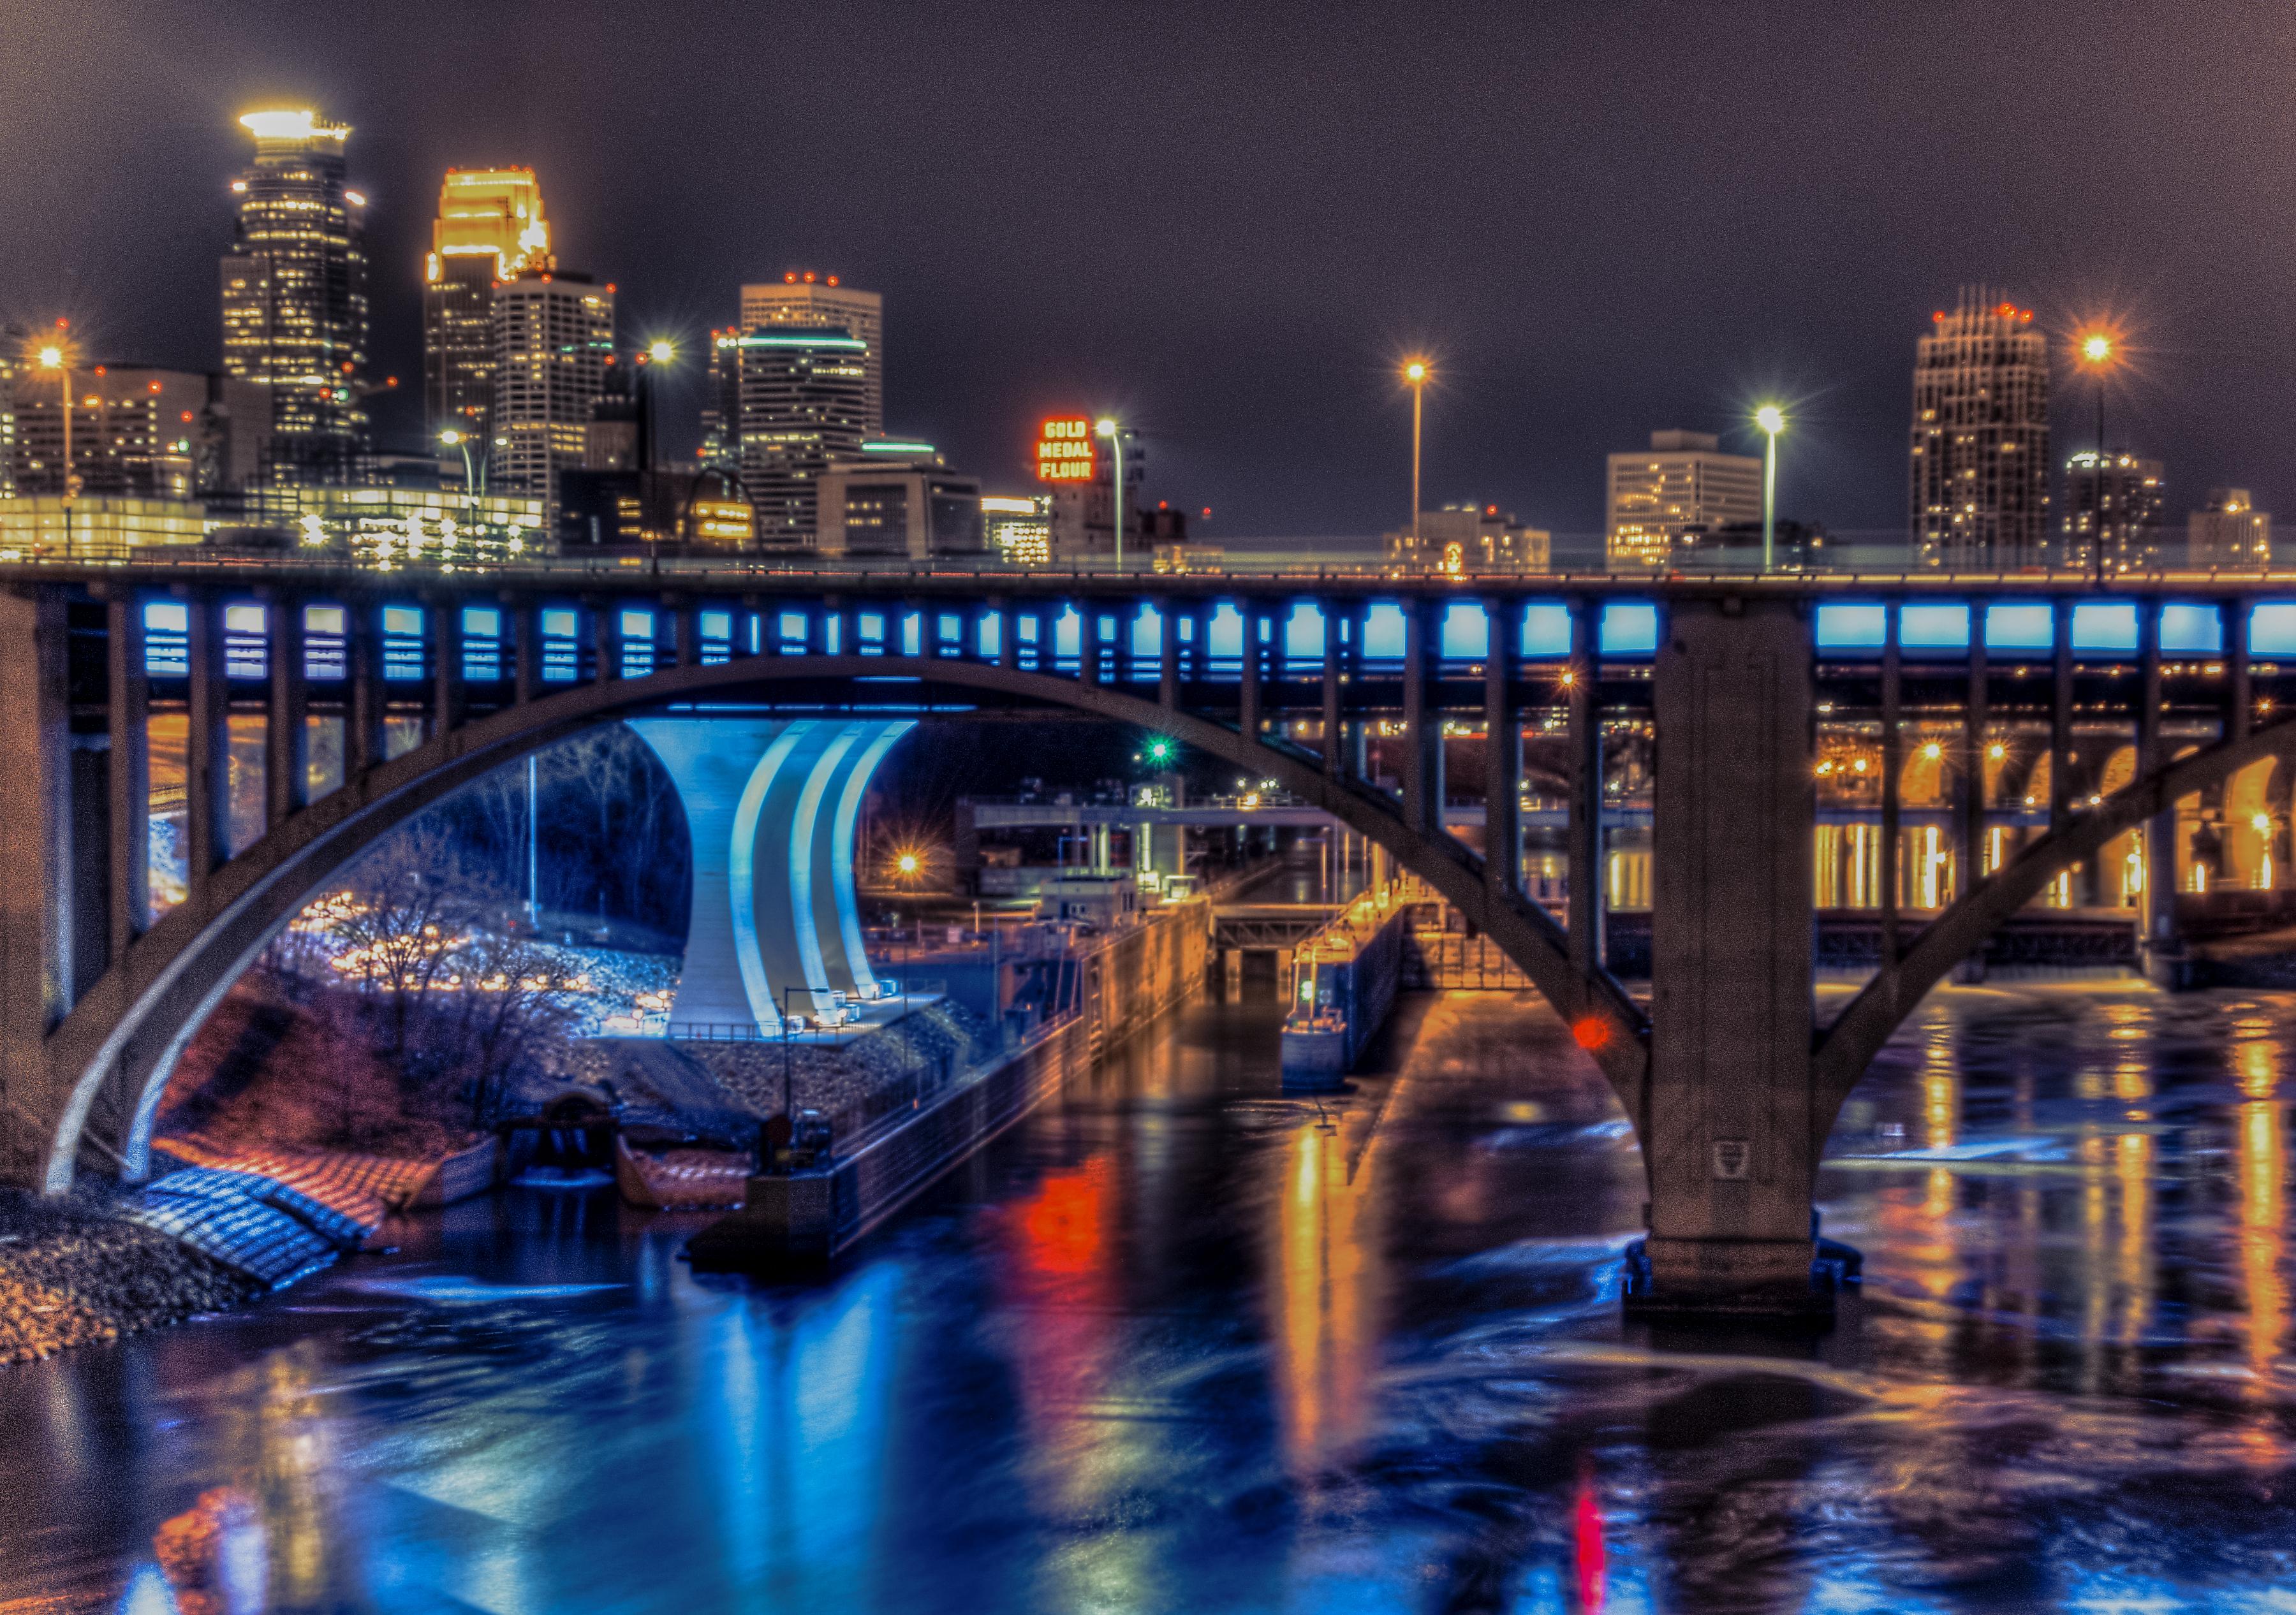 Night Blues in Minneapolis